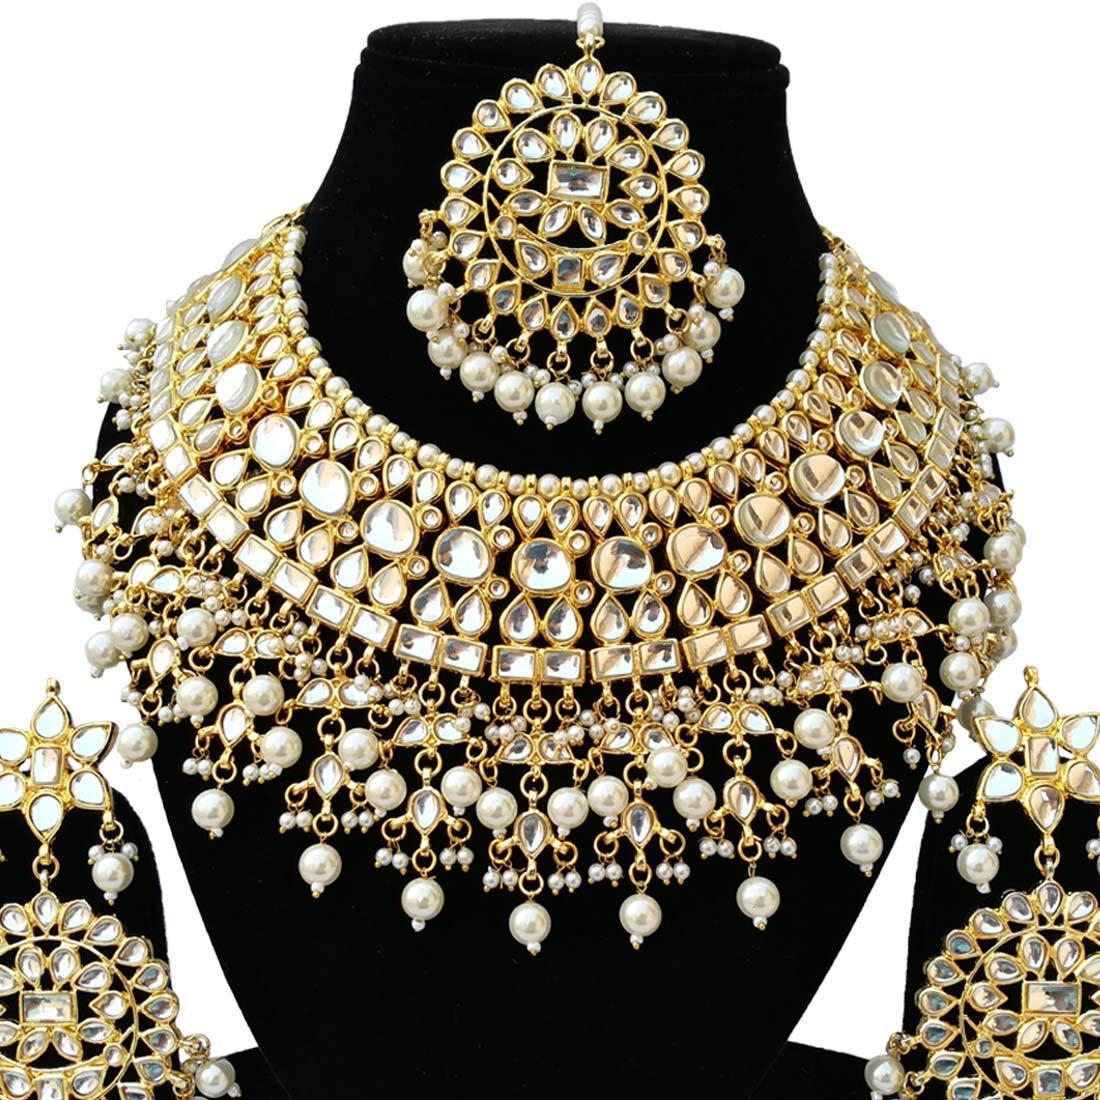 Fkraft Meena Kundan Gold Plated Latest Wedding Designer Choker Necklace Jewelry Earrings Tikka Set